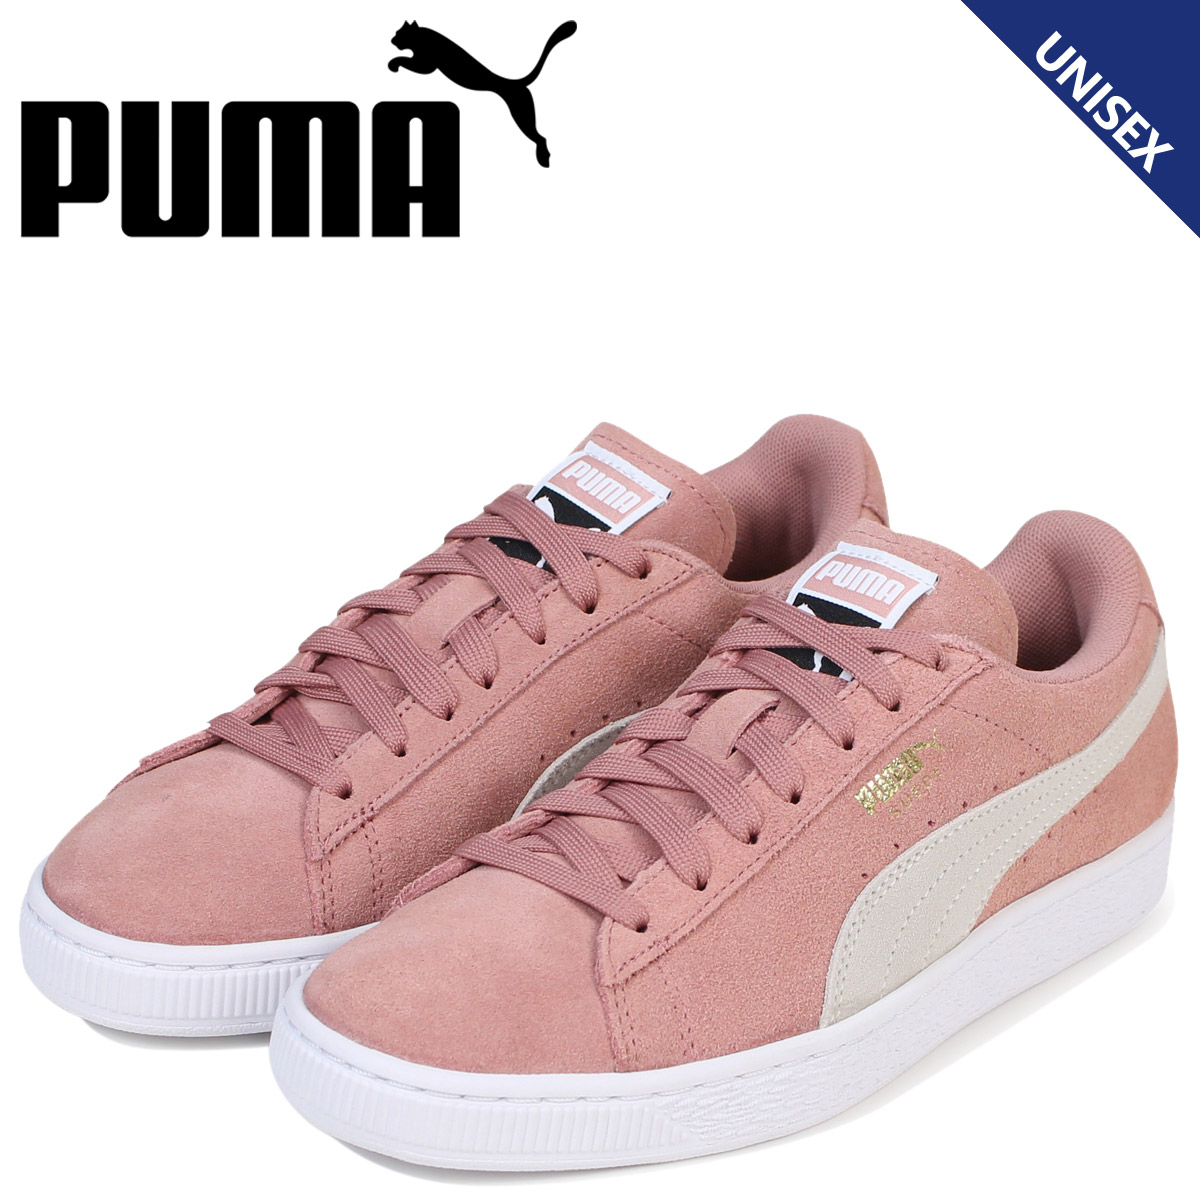 Puma Schuhe Pink PUMA Kaufen | Puma Schuhe Online Shop